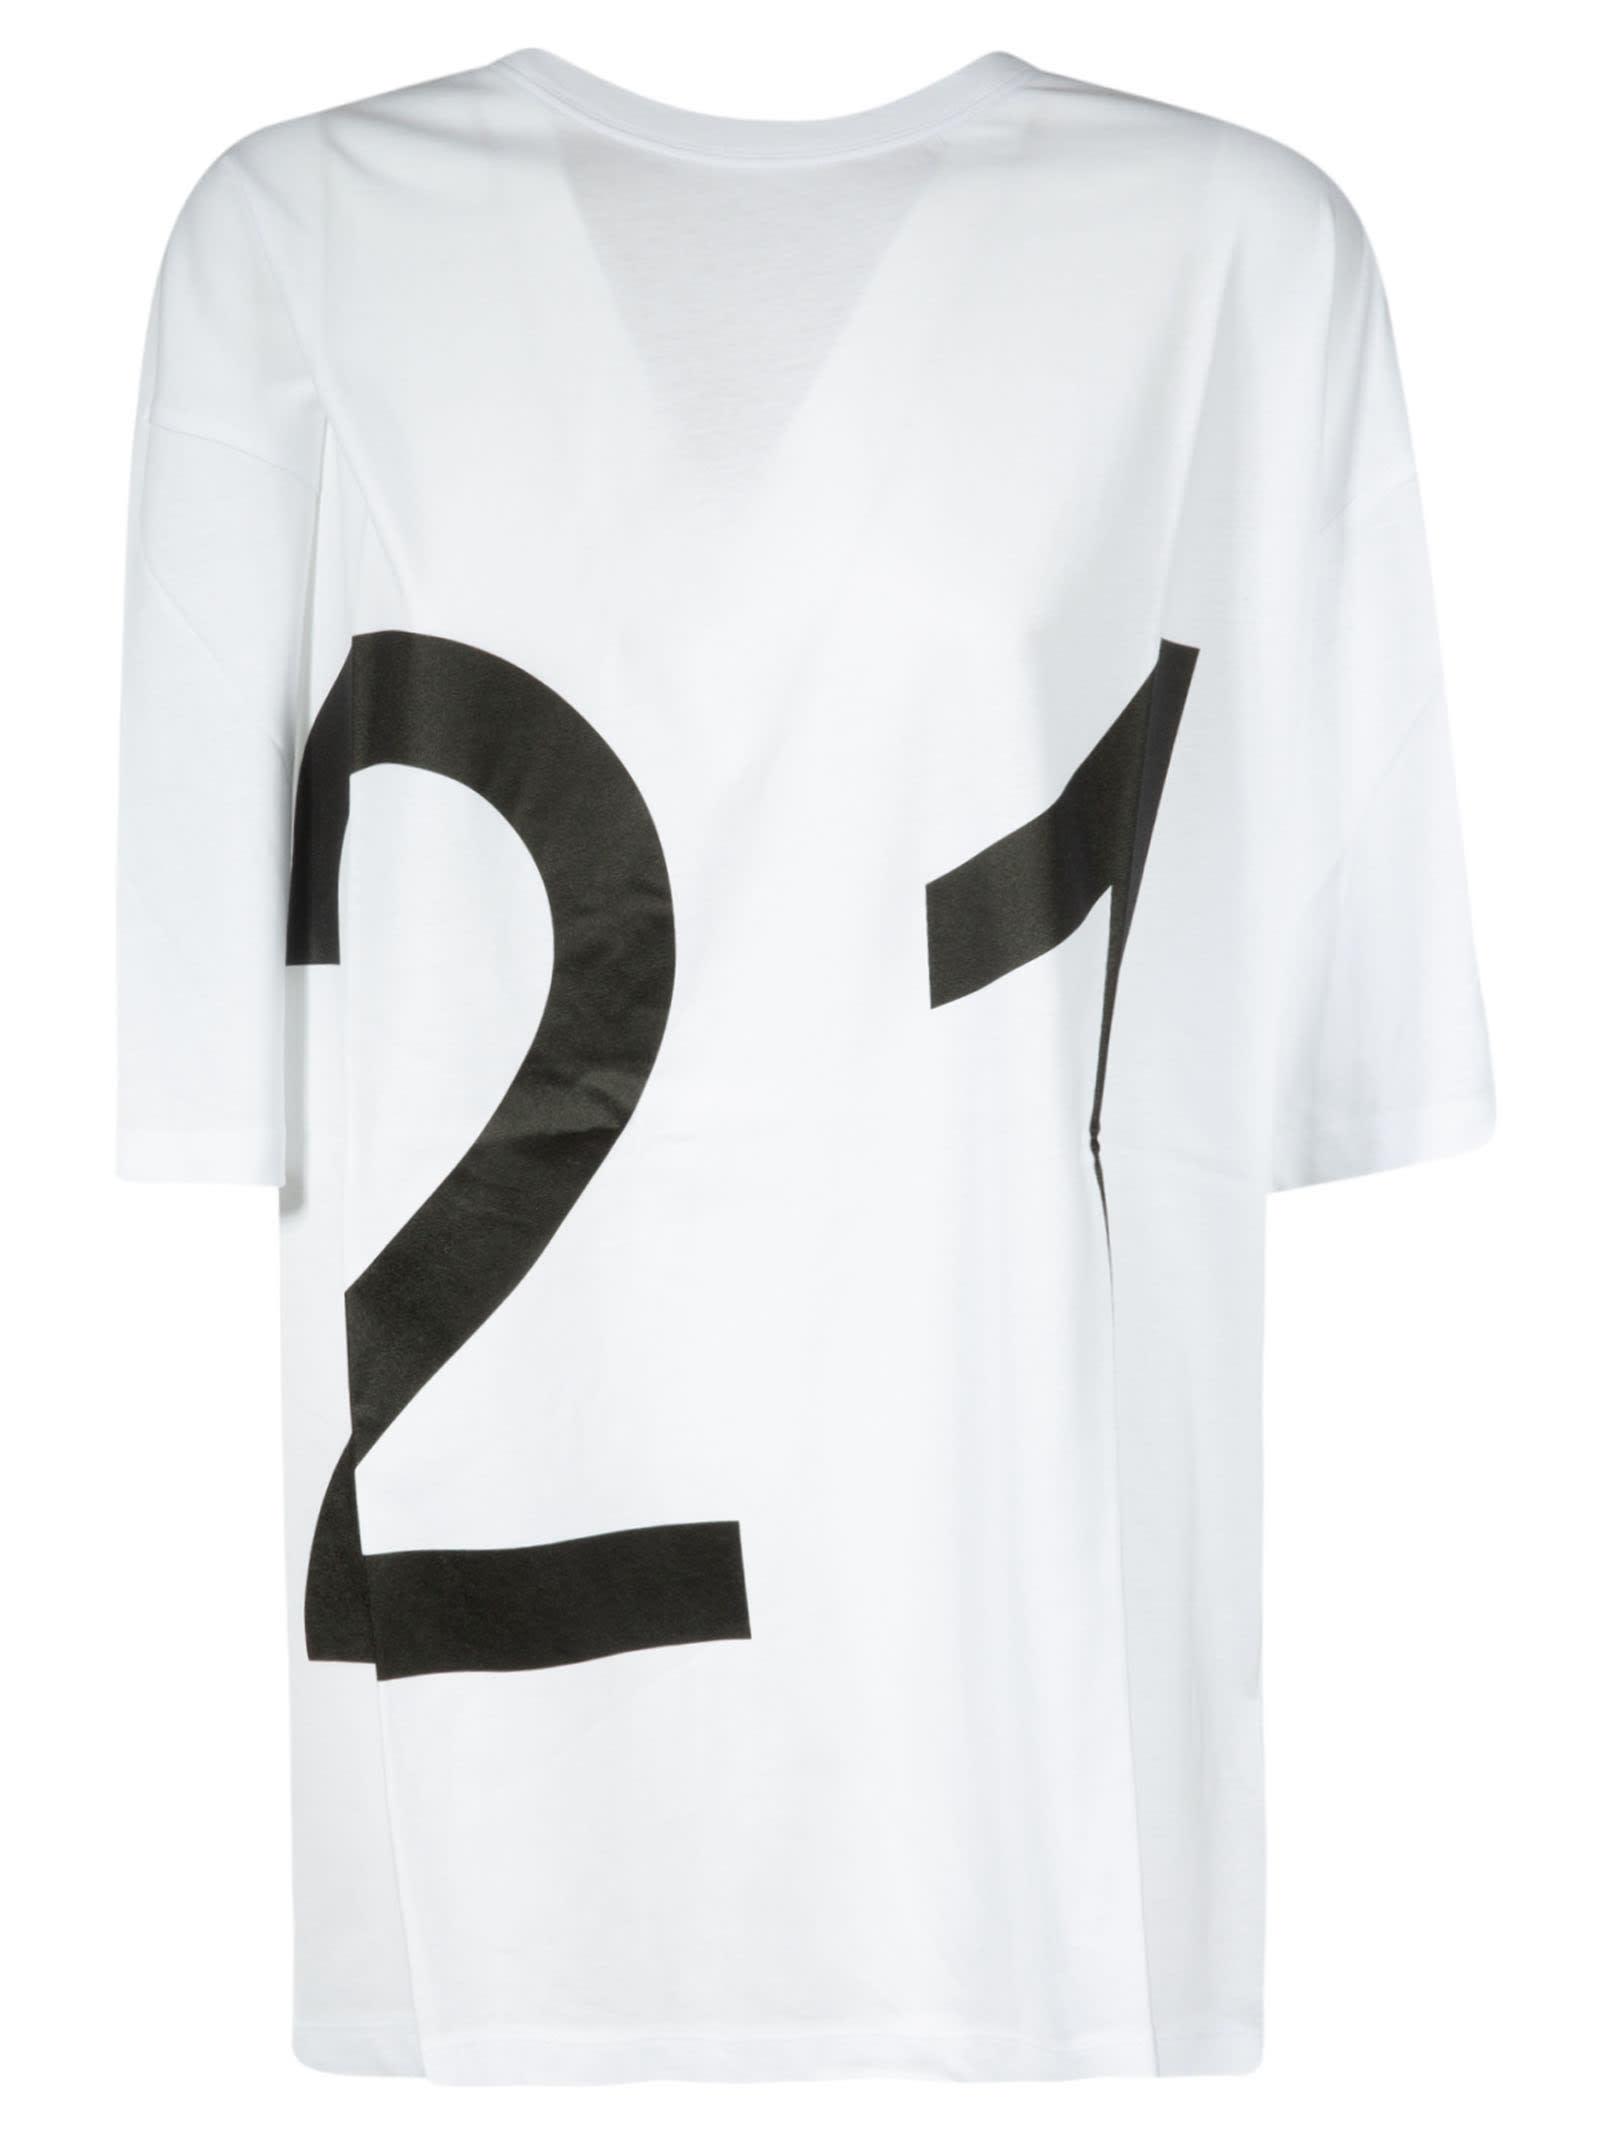 N.21 Logo Print Loose Fit T-shirt